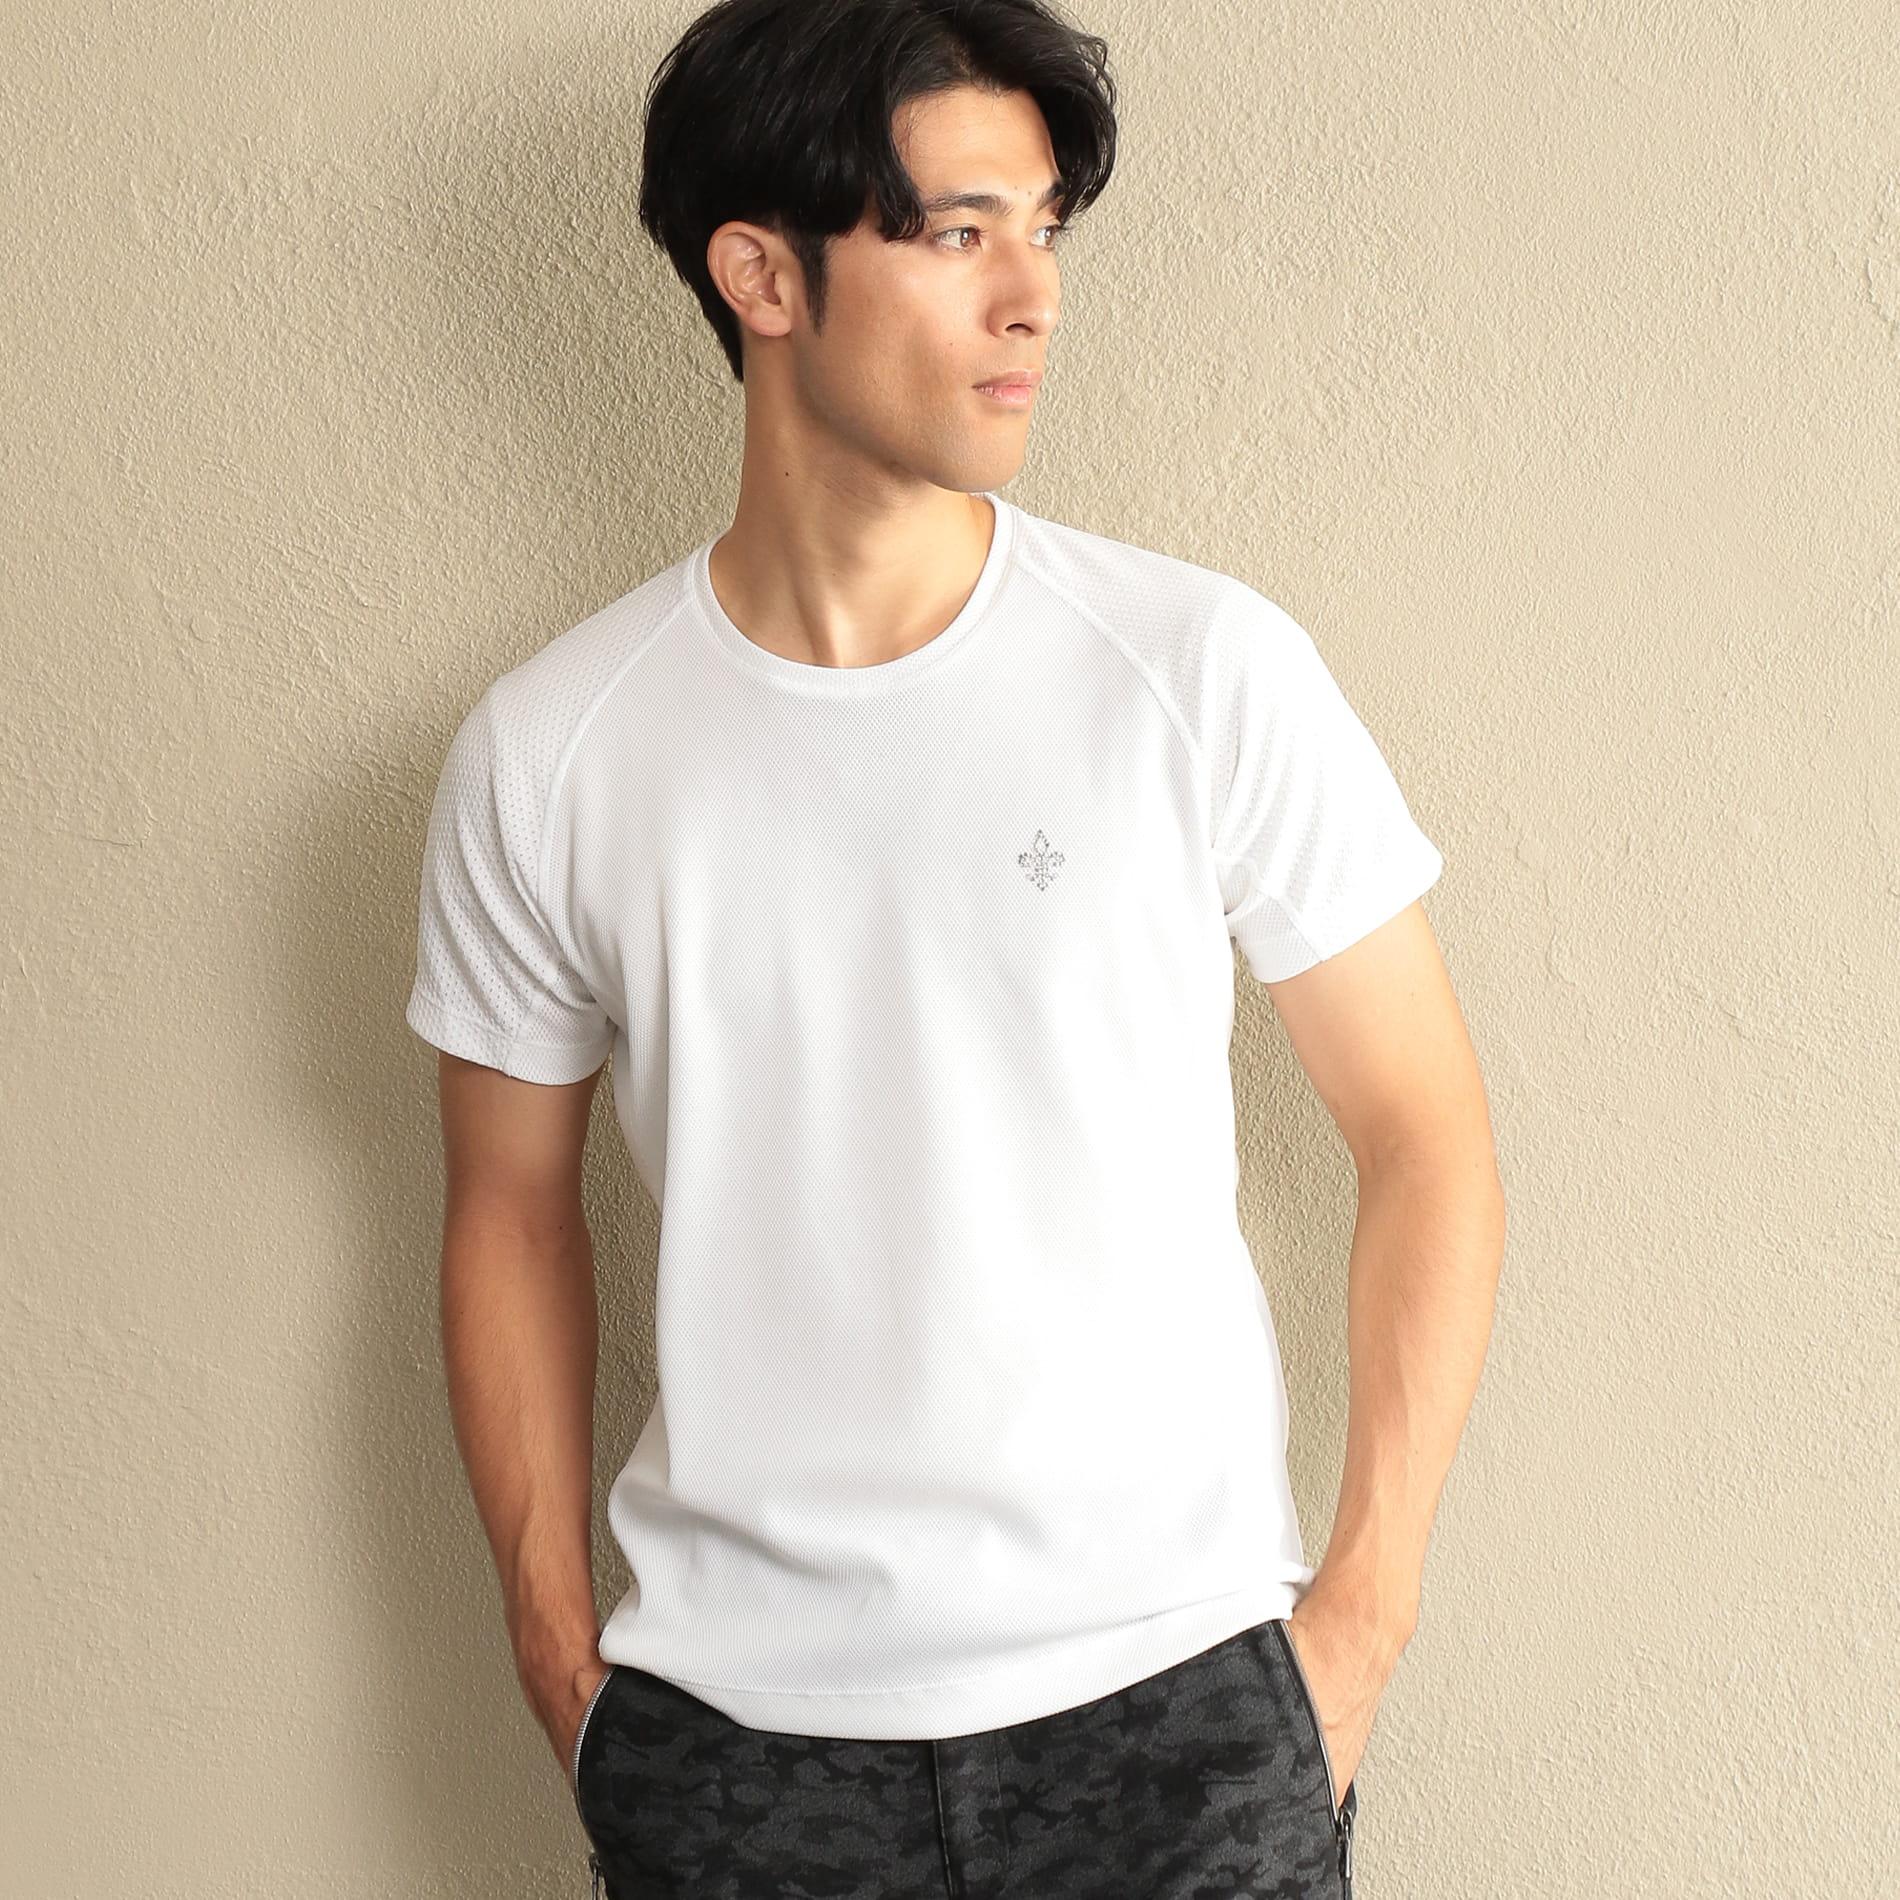 【SPORTY LINE】*Safari10月号掲載*ワンポイントクルーネックTシャツ